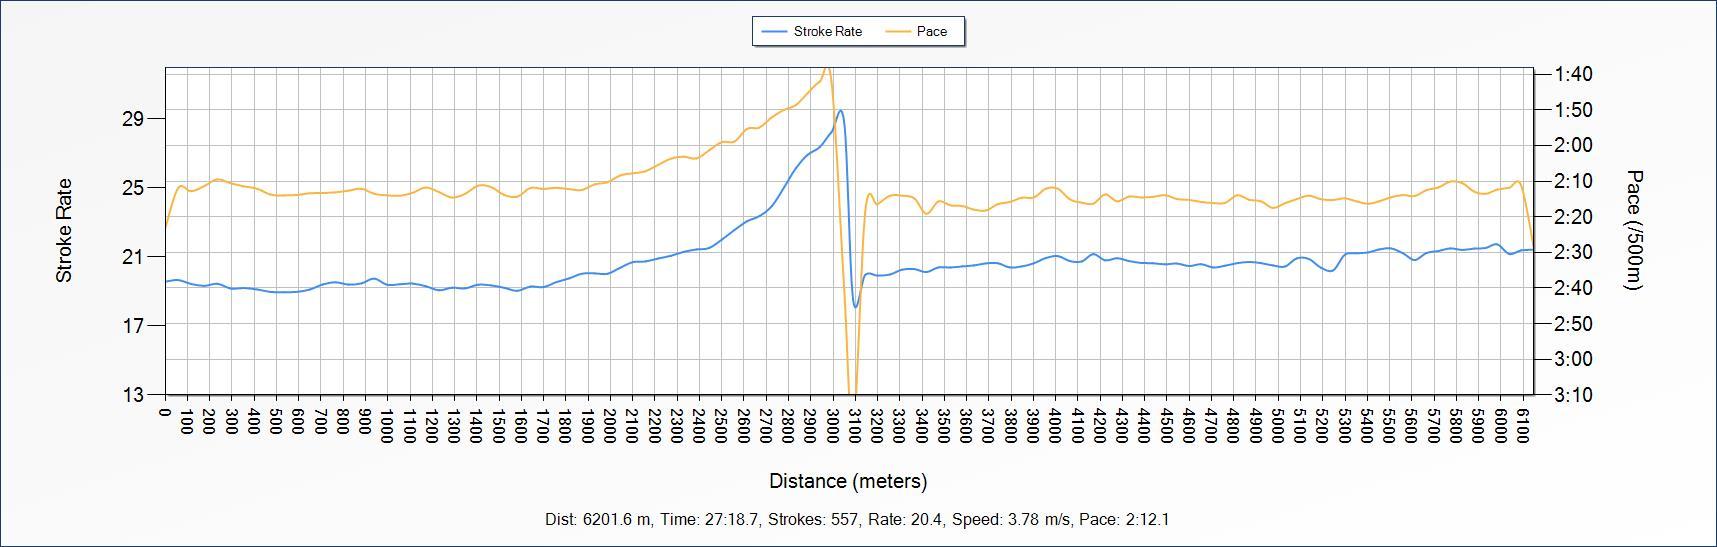 Age average 60 - range 40 to 86 - 1:40 split at 28 strokes per minute. Great start into 2016